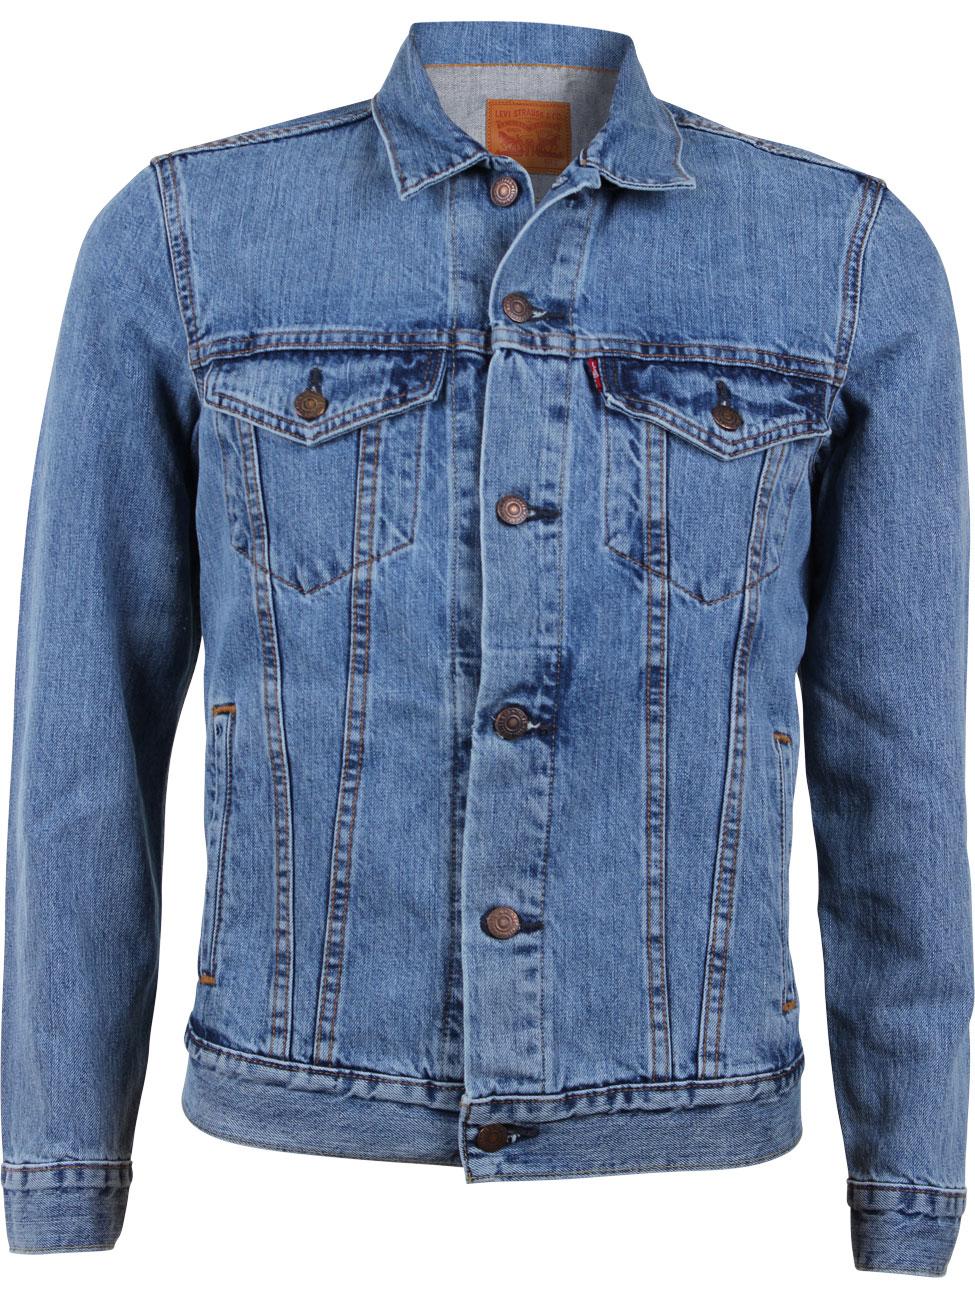 levi 39 s herren jeansjacke the trucker jacket regular fit. Black Bedroom Furniture Sets. Home Design Ideas